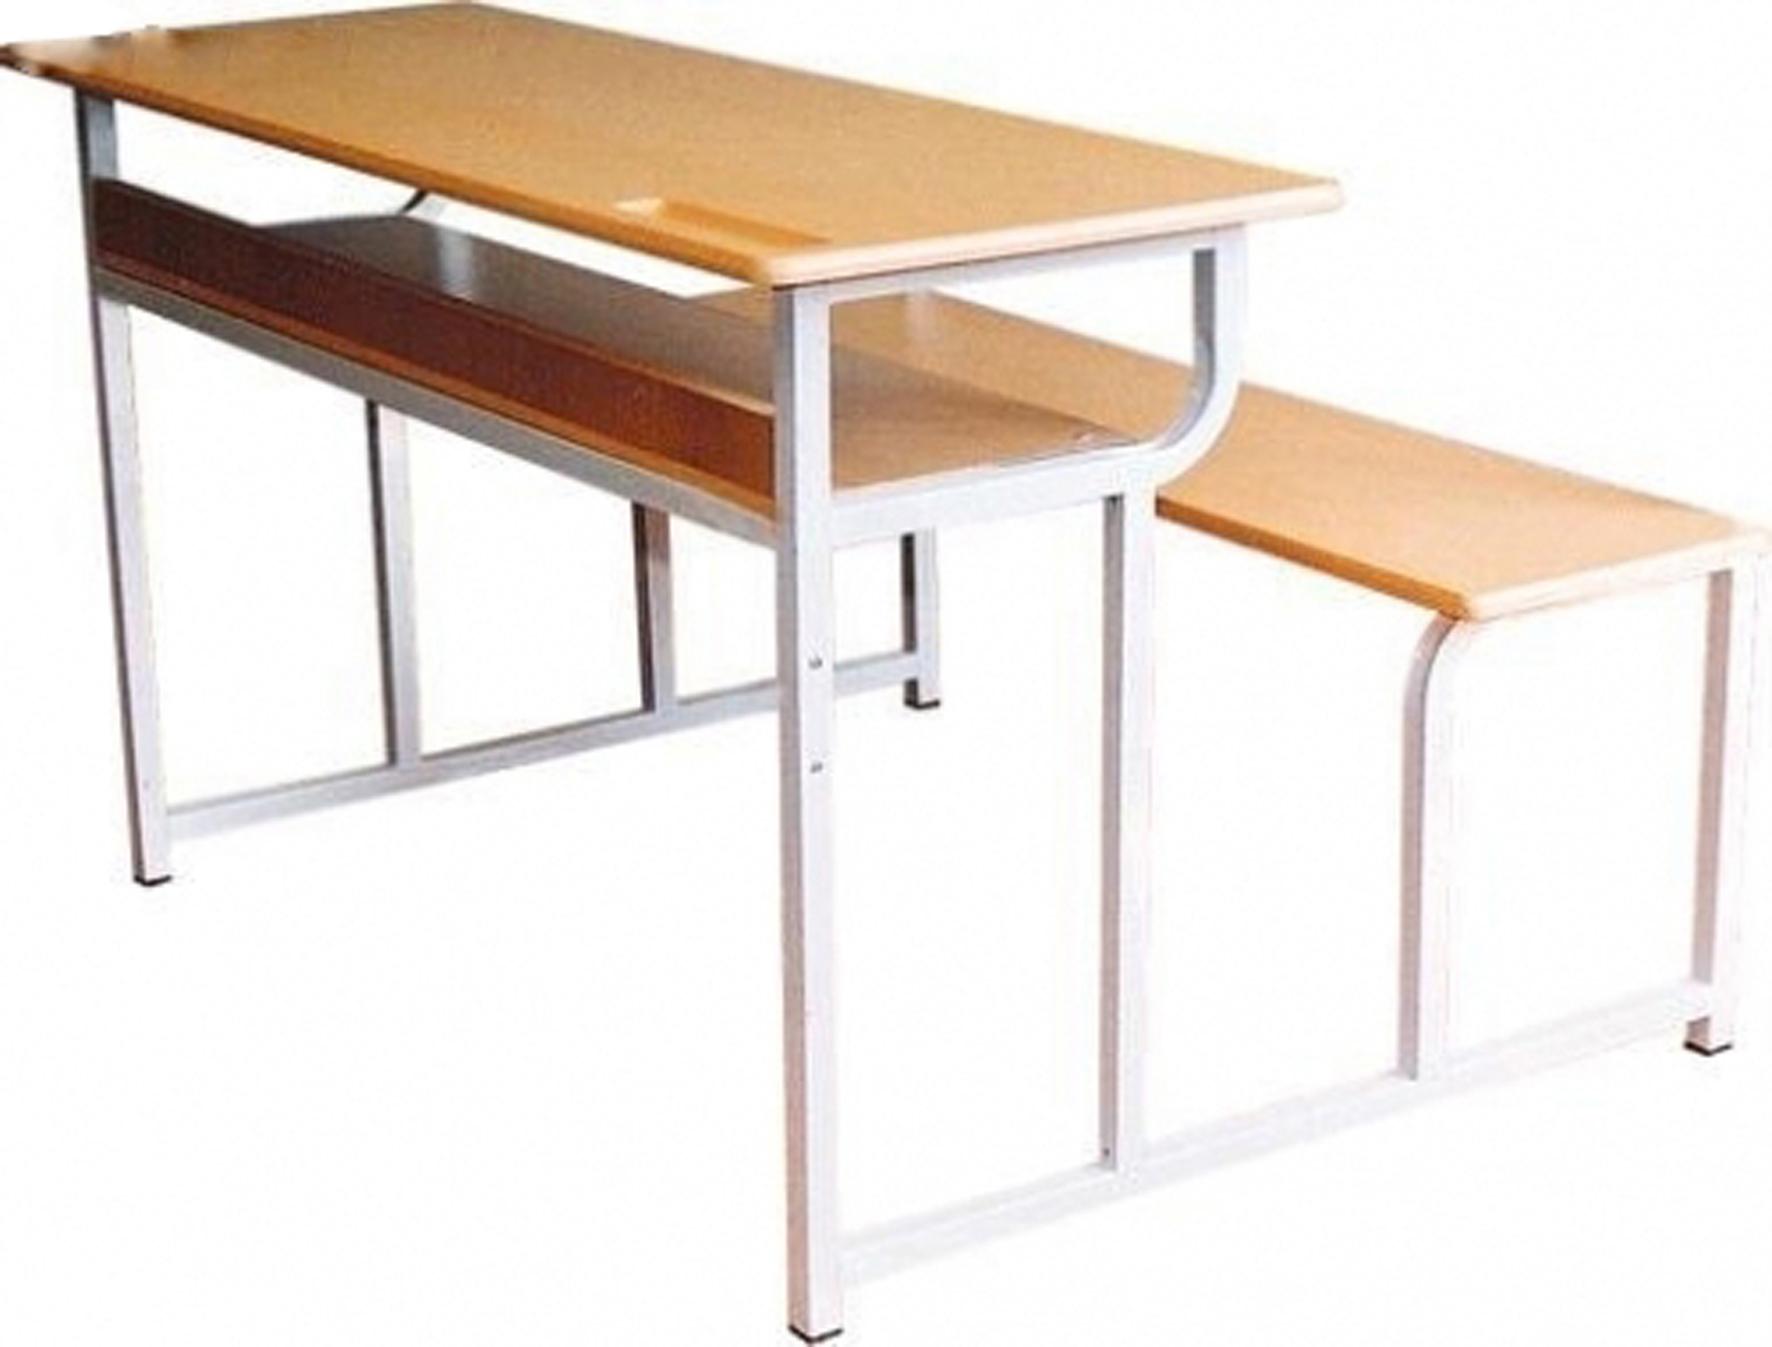 ban ghe hoc sinh, bàn ghế học sinh